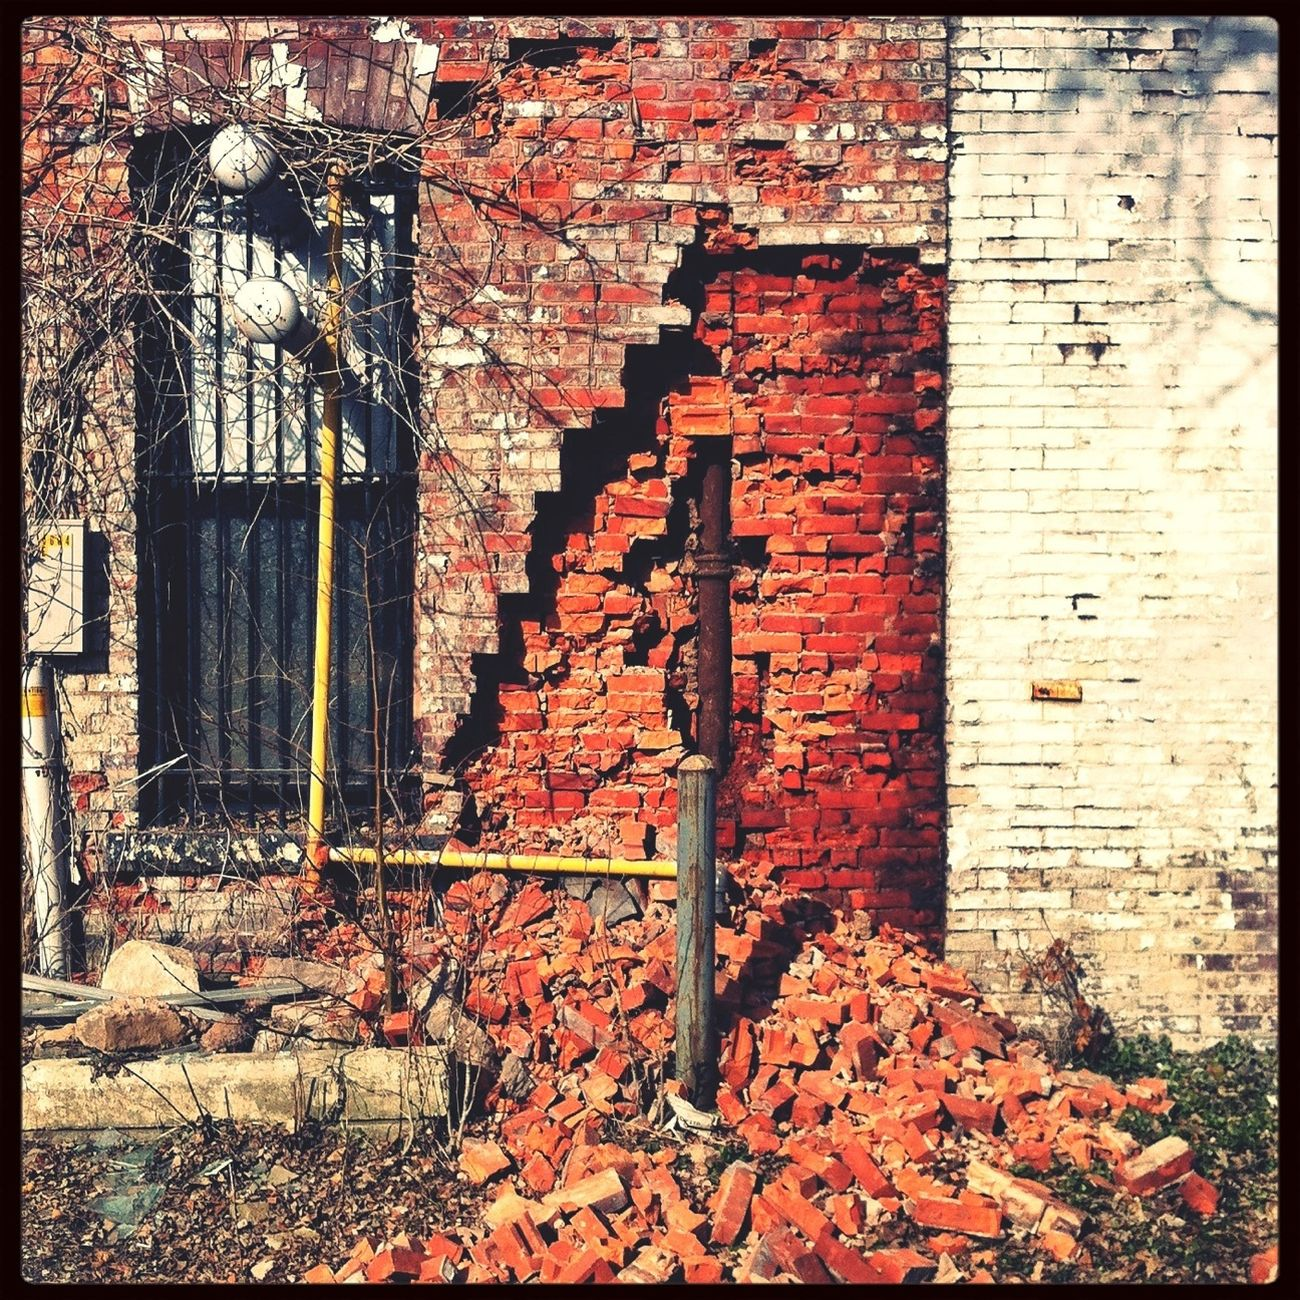 Abandoned & Derelict Backstreets & Alleyways Brickporn